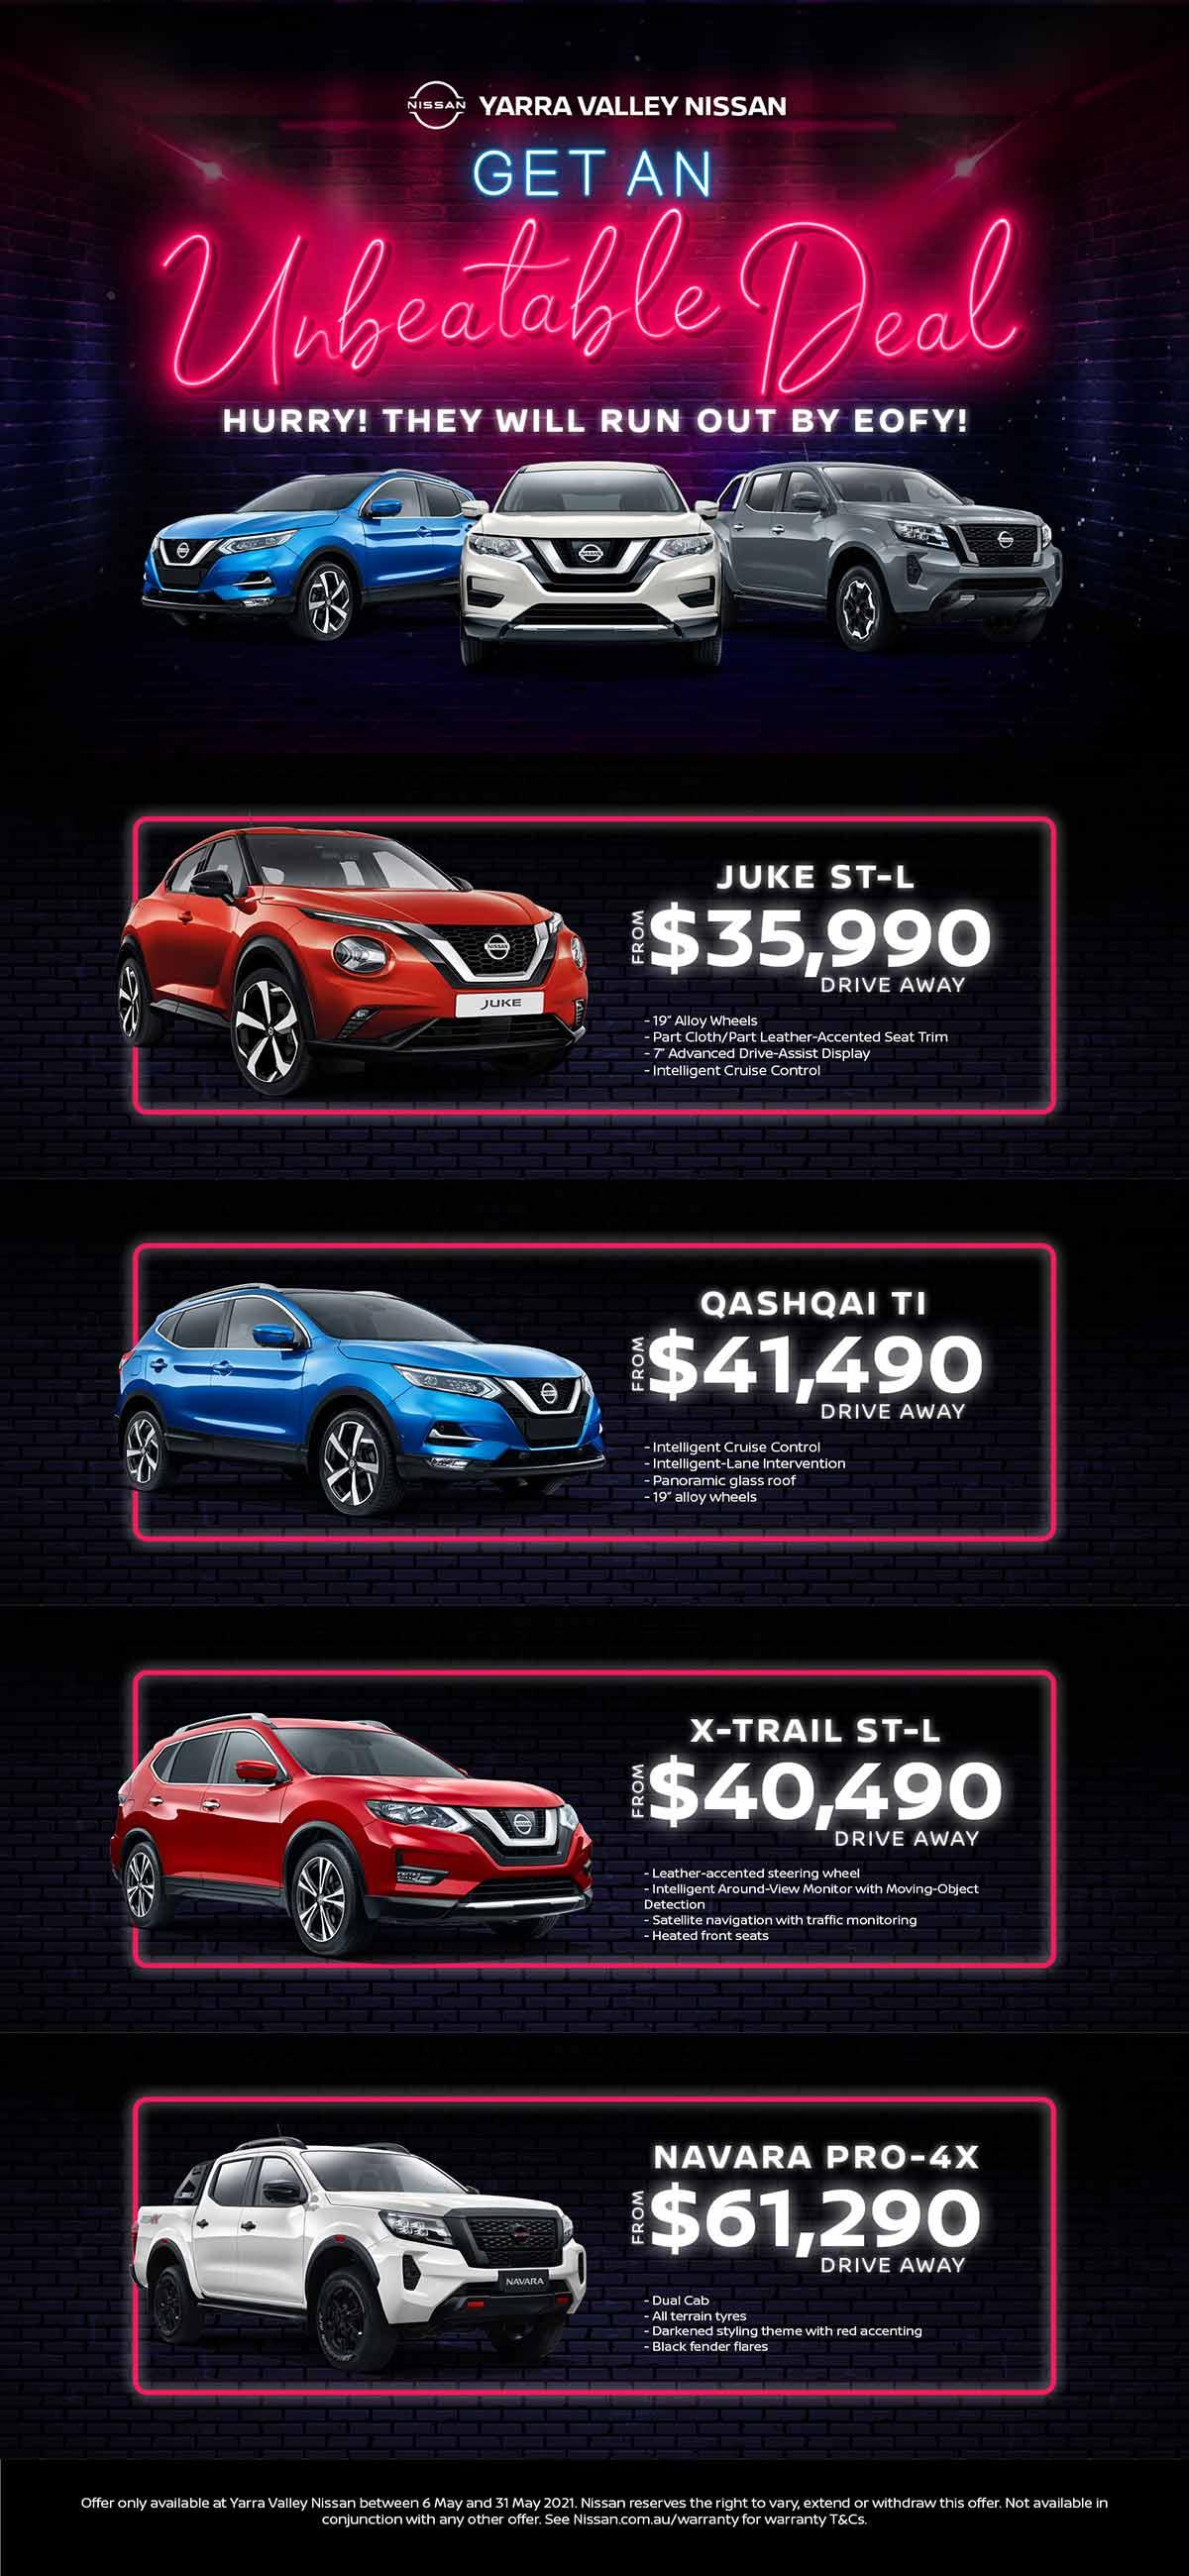 Yarra Valley Nissan   Unbeatable Deal!